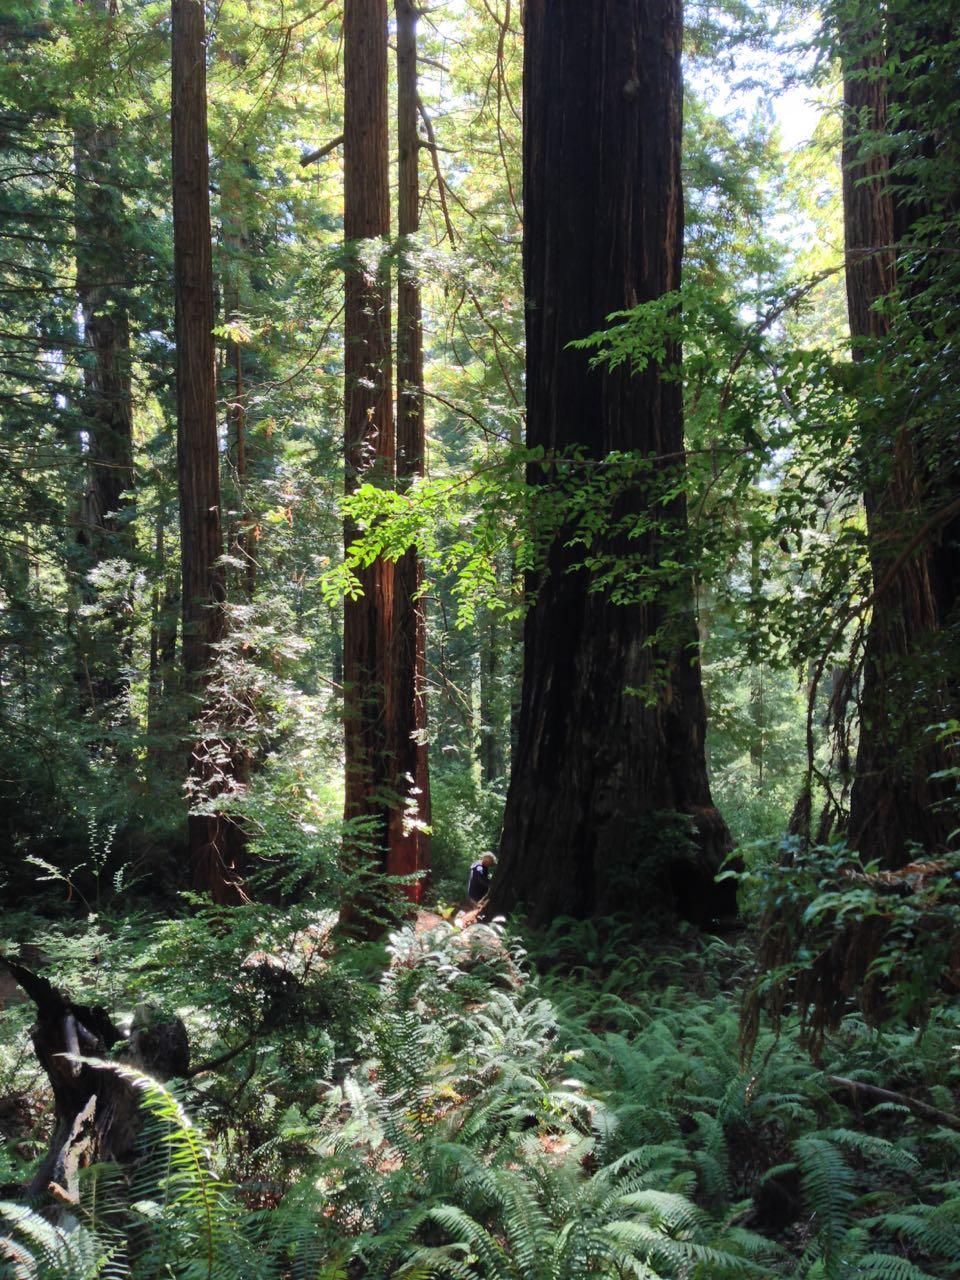 Redwoods 2017 10 01 222 Of 244